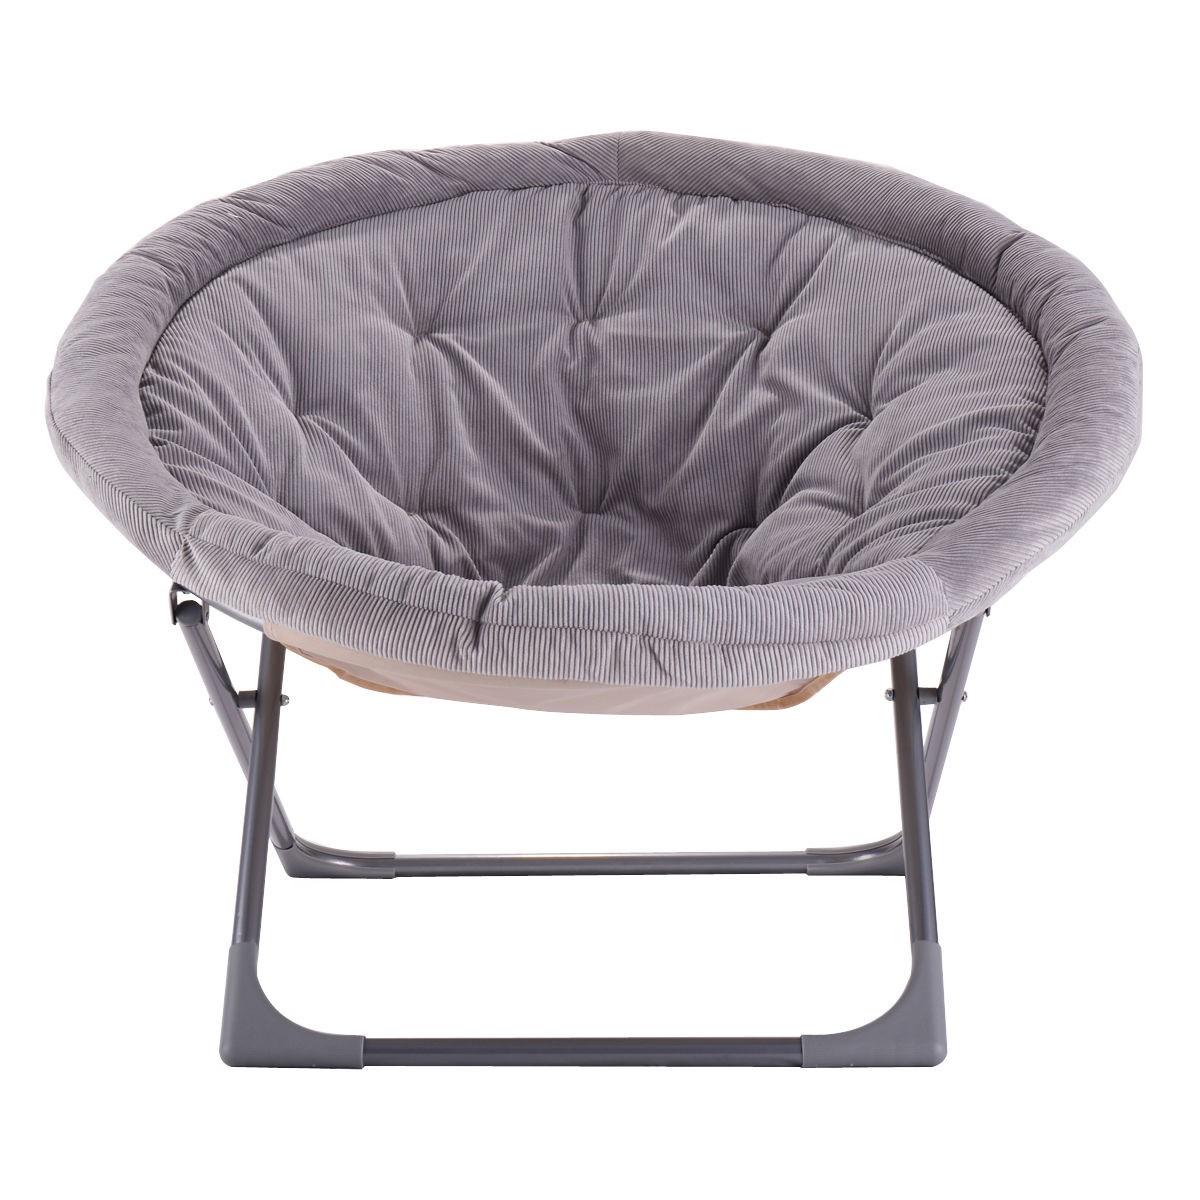 new oversized large folding saucer moon chair corduroy. Black Bedroom Furniture Sets. Home Design Ideas